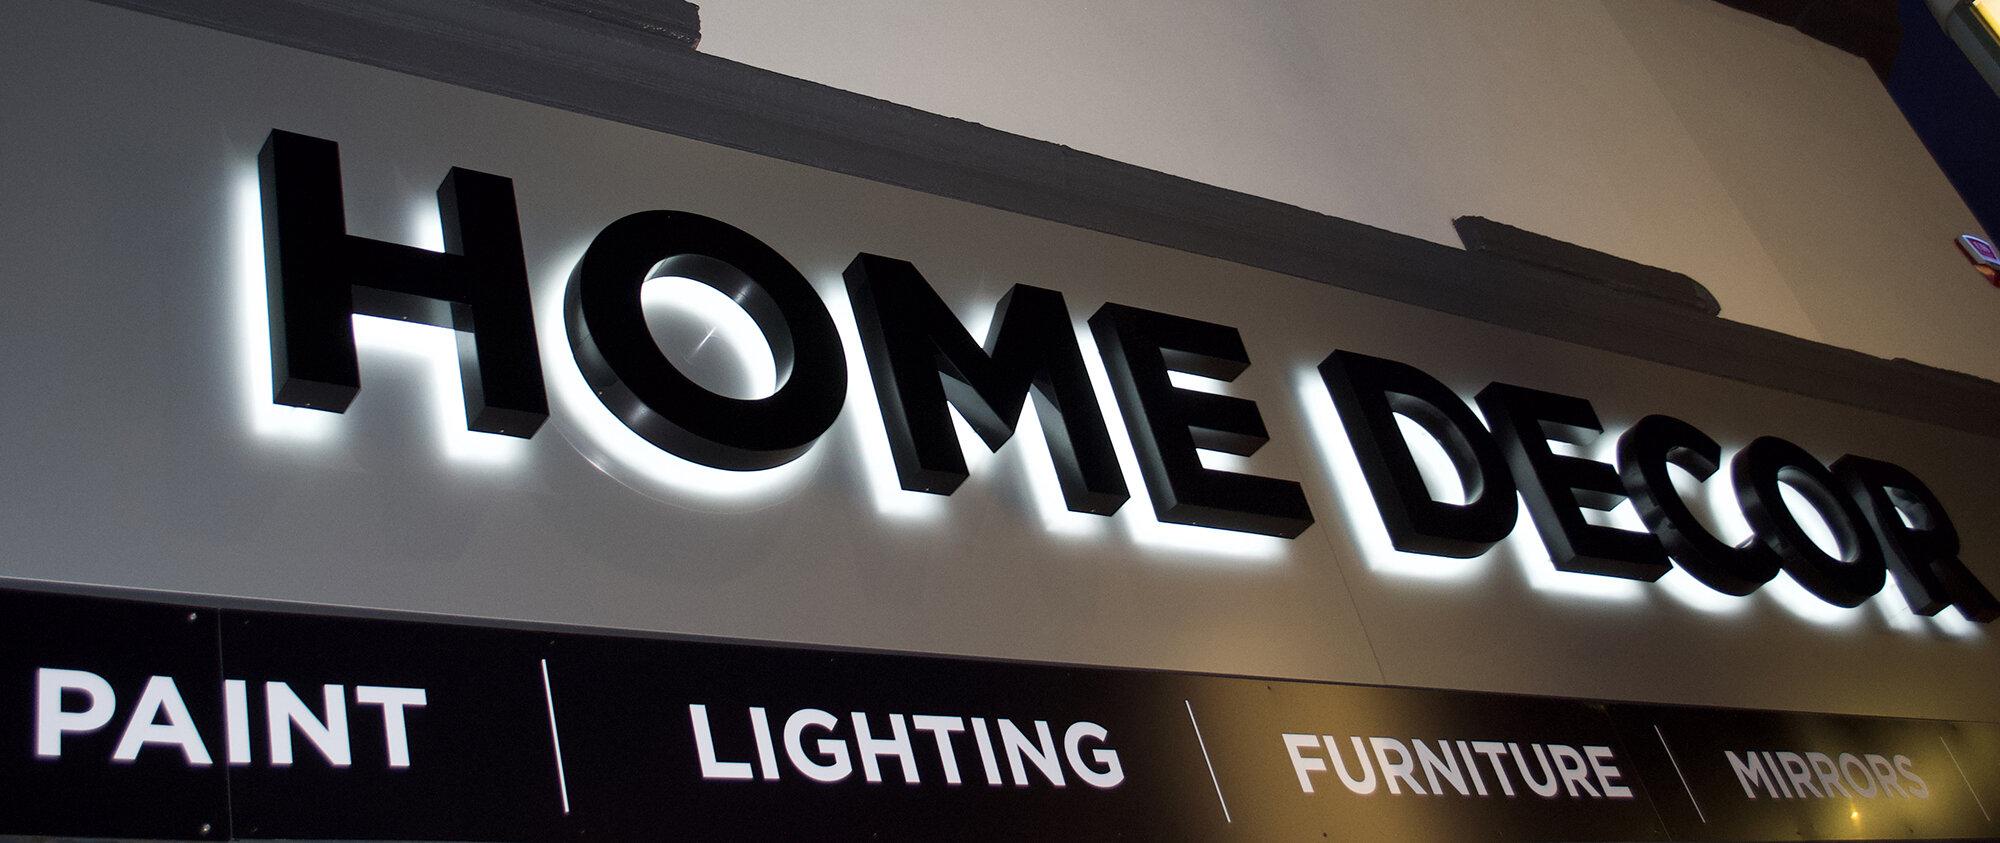 Eg Home Decor In Liverpool Wallpaper Paint Furniture Lighting